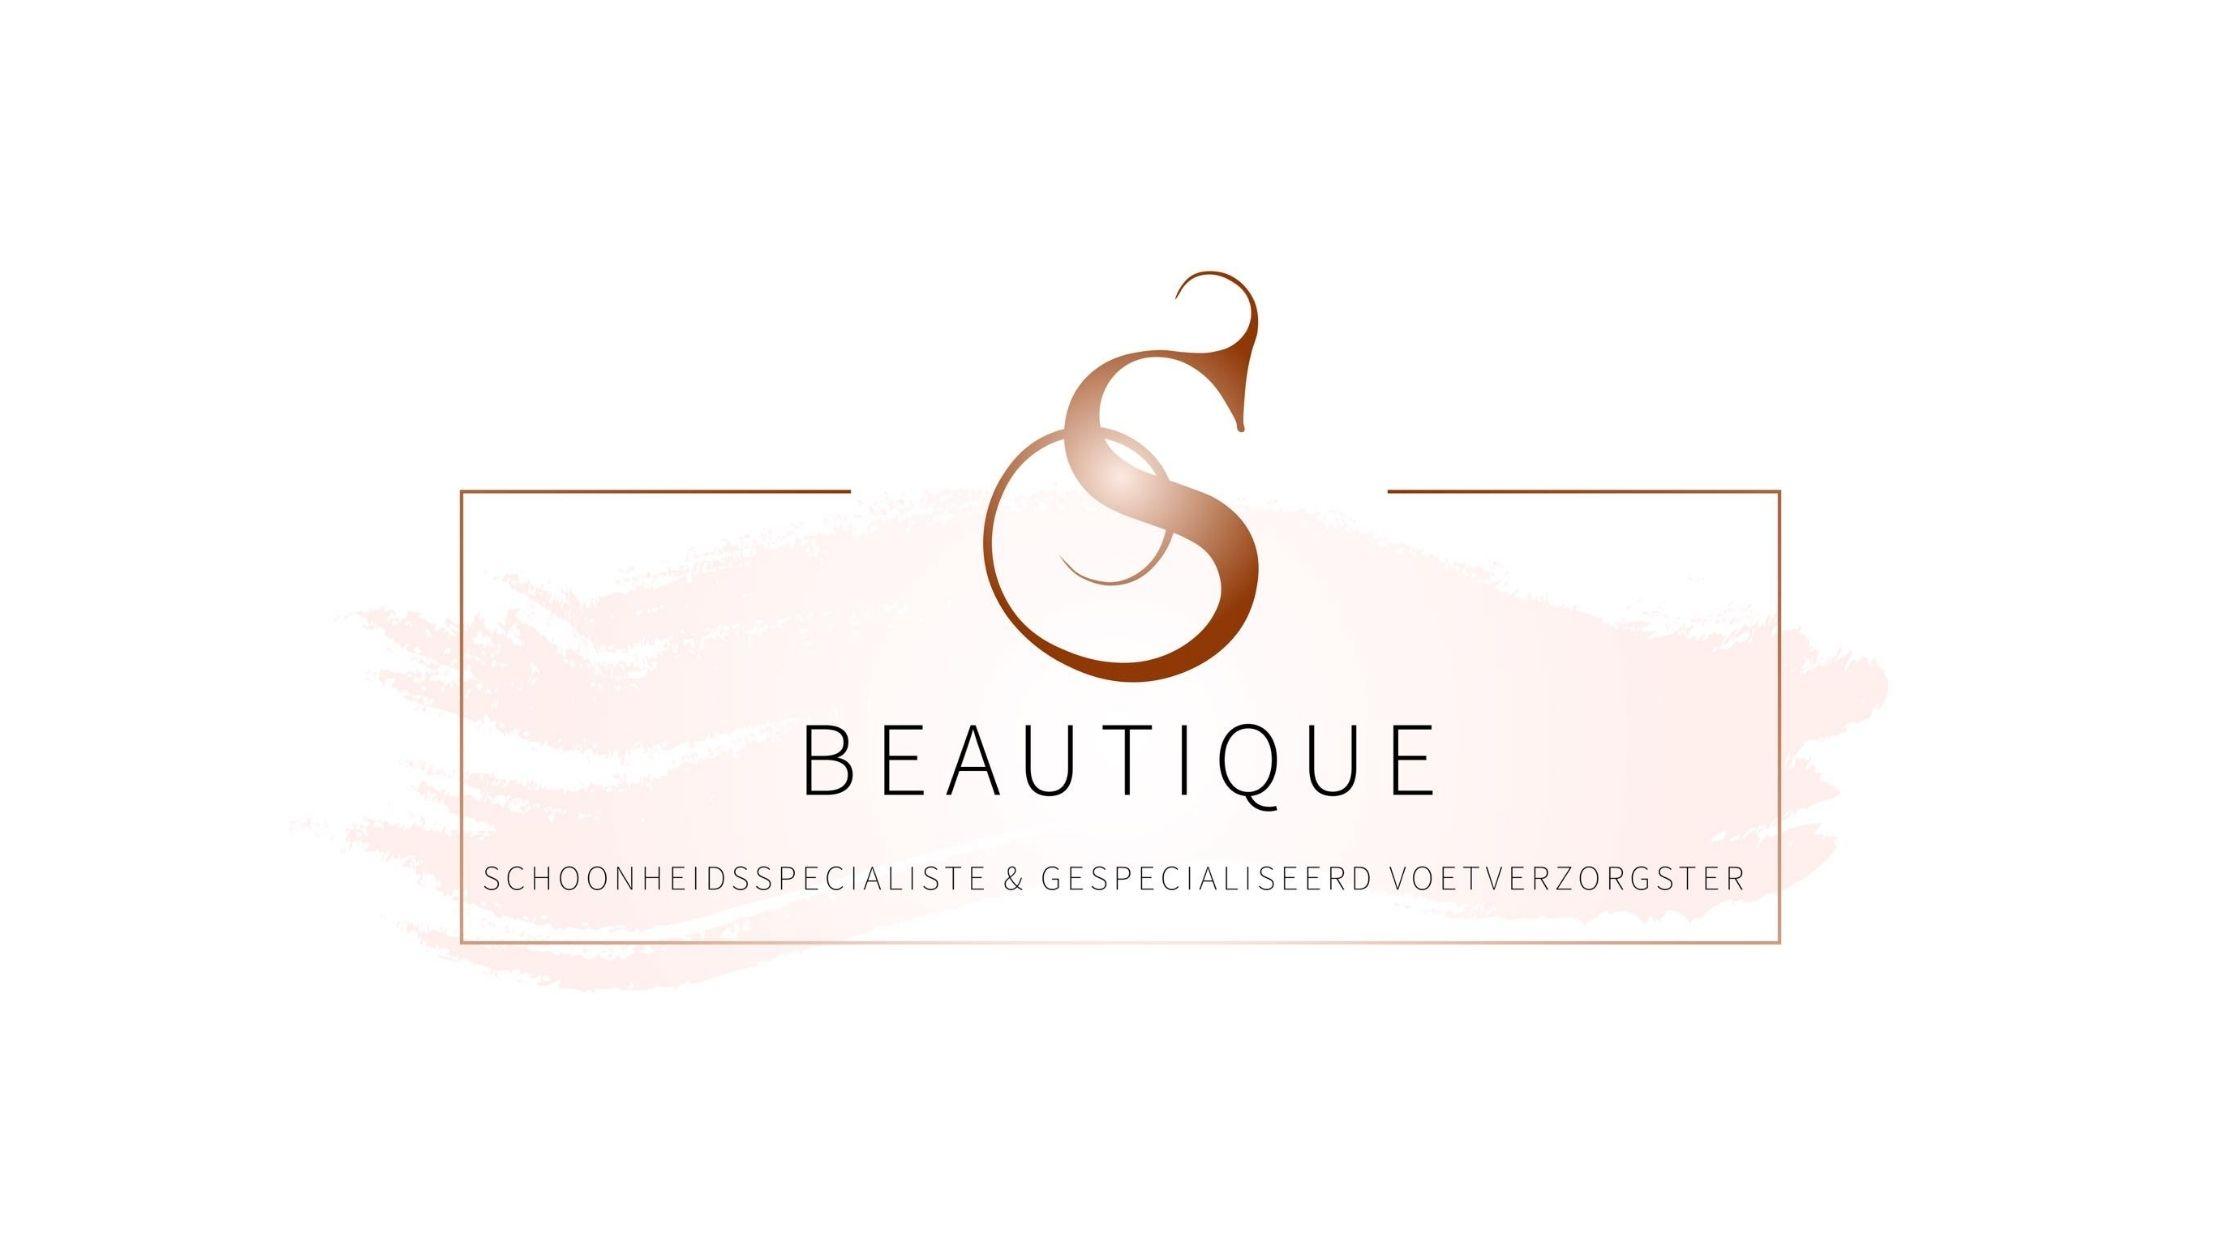 sbeautique logo